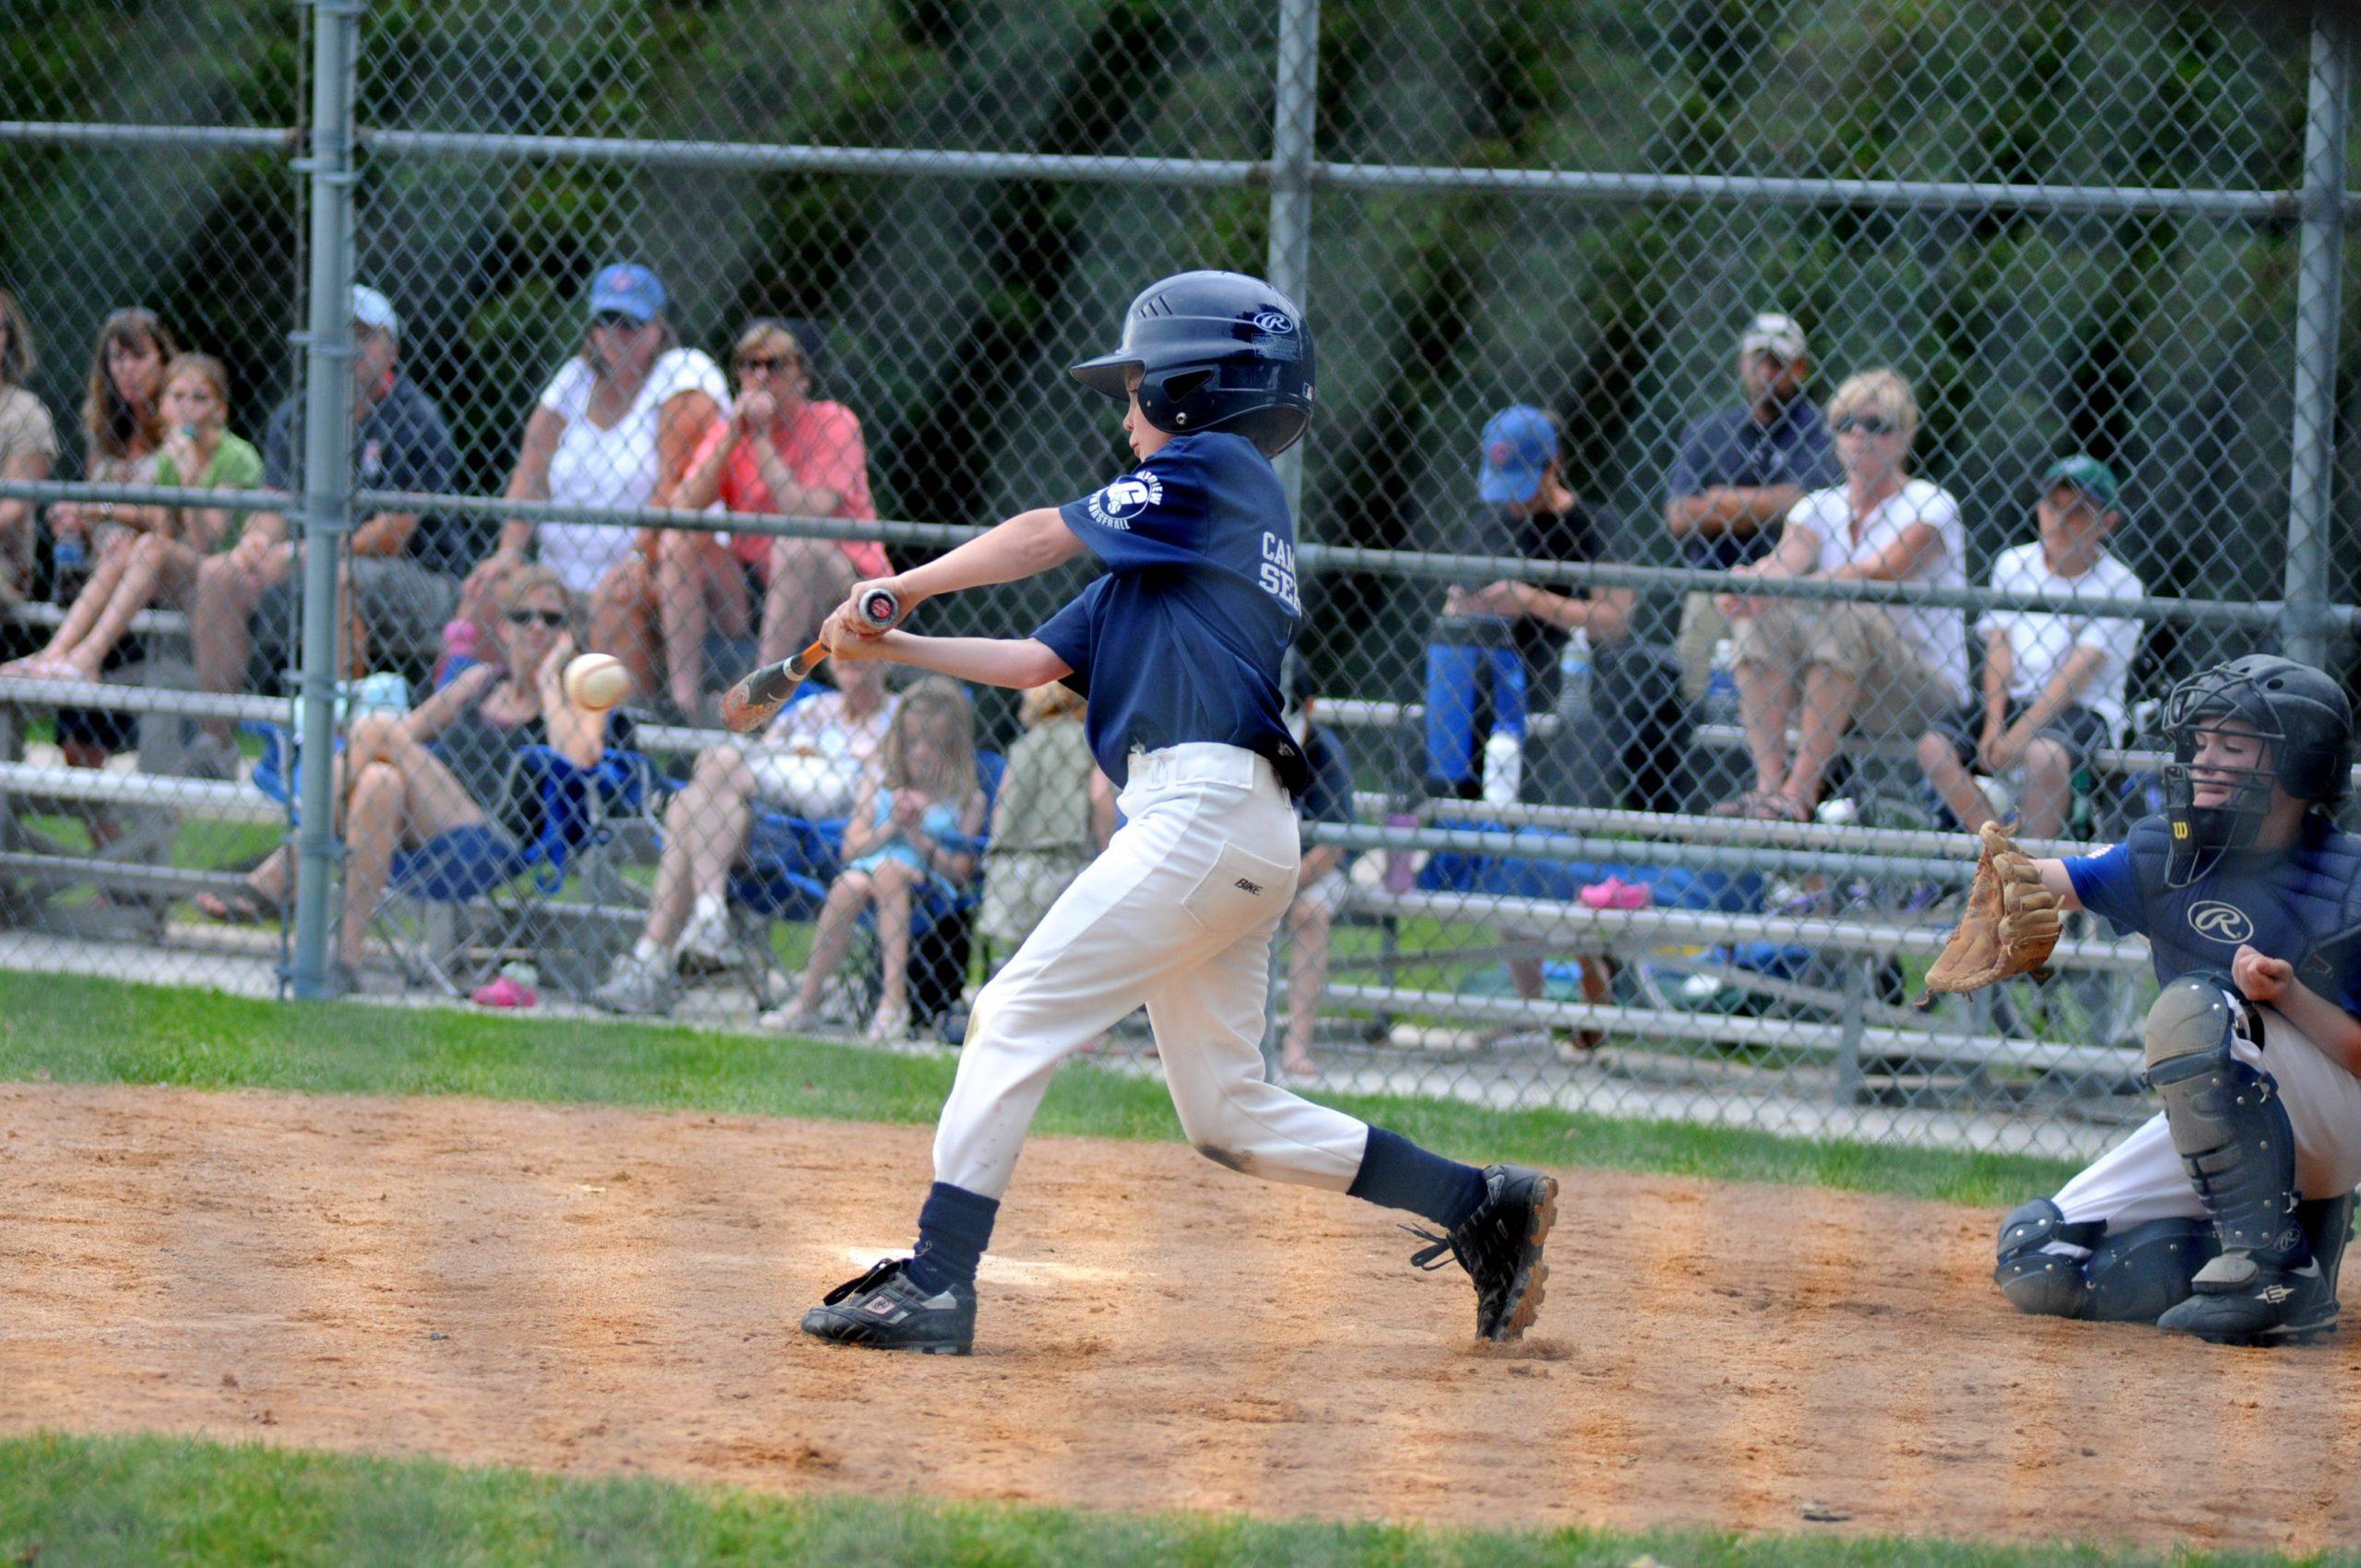 kid hitting baseball at little league game